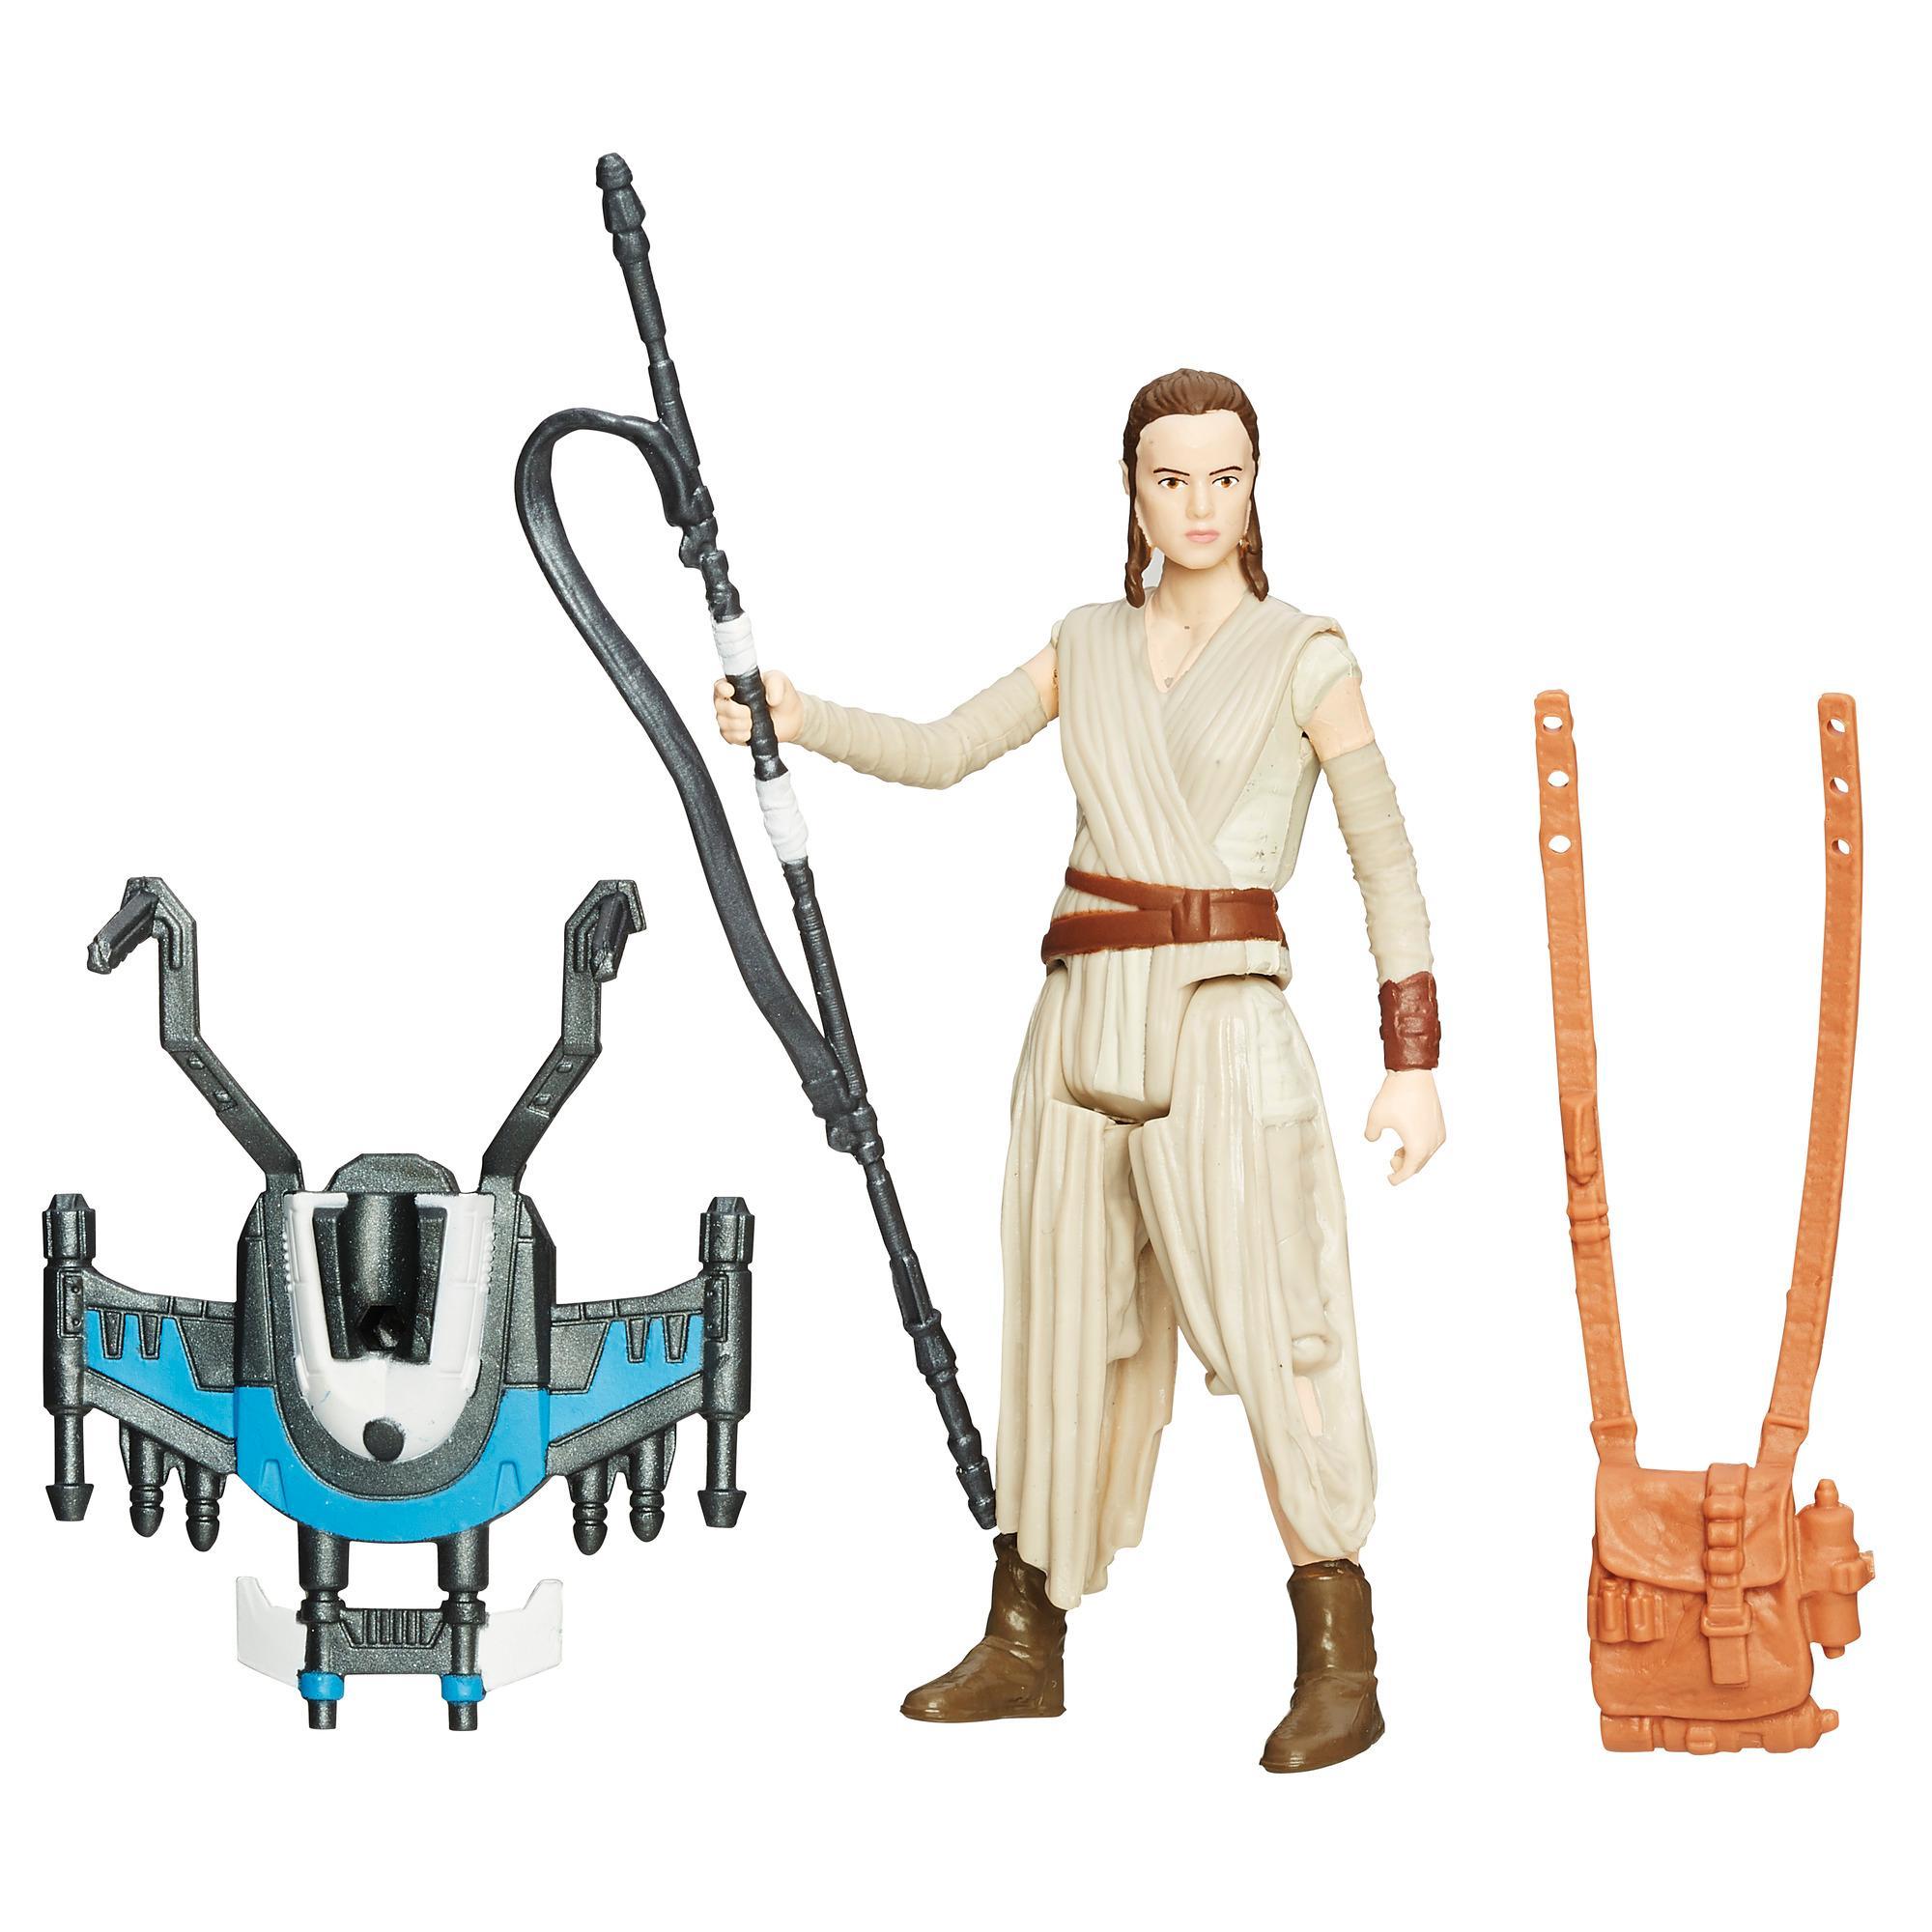 Star Wars The Force Awakens Figura de 9,50 cm (3,75 in) Snow Mission Rey (Base Starkiller)